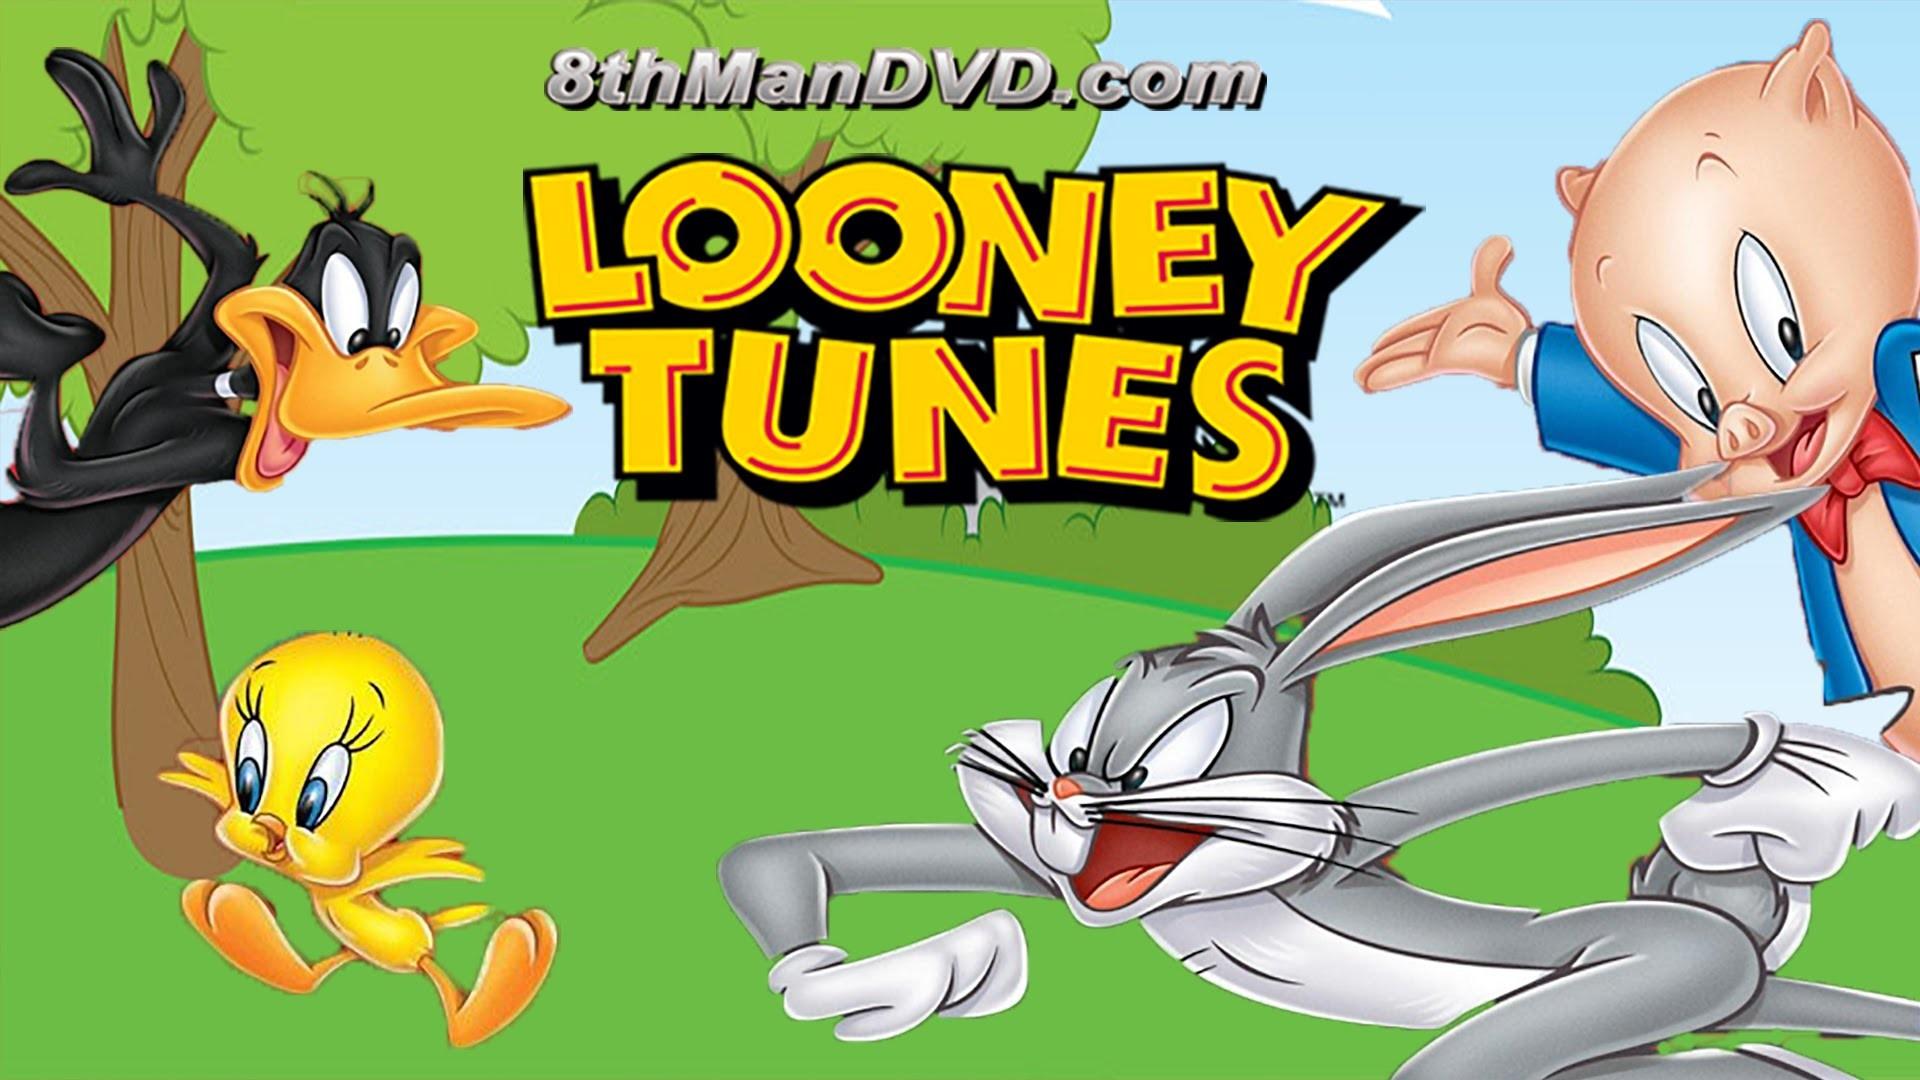 Looney Tunes Wallpaper Windows 7 (41+ images)